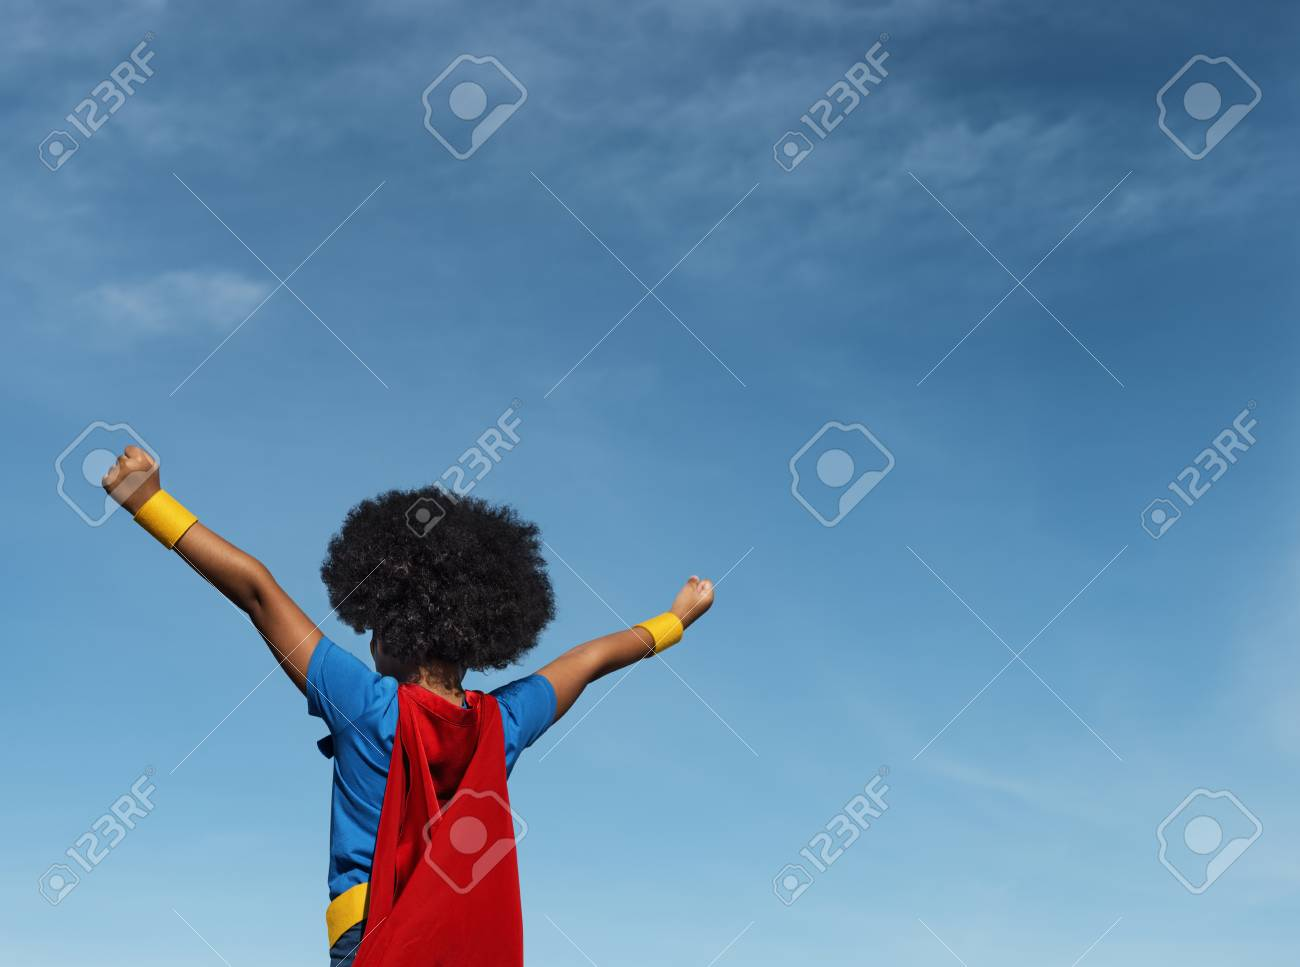 Girl with afro playing superhero - 90667107